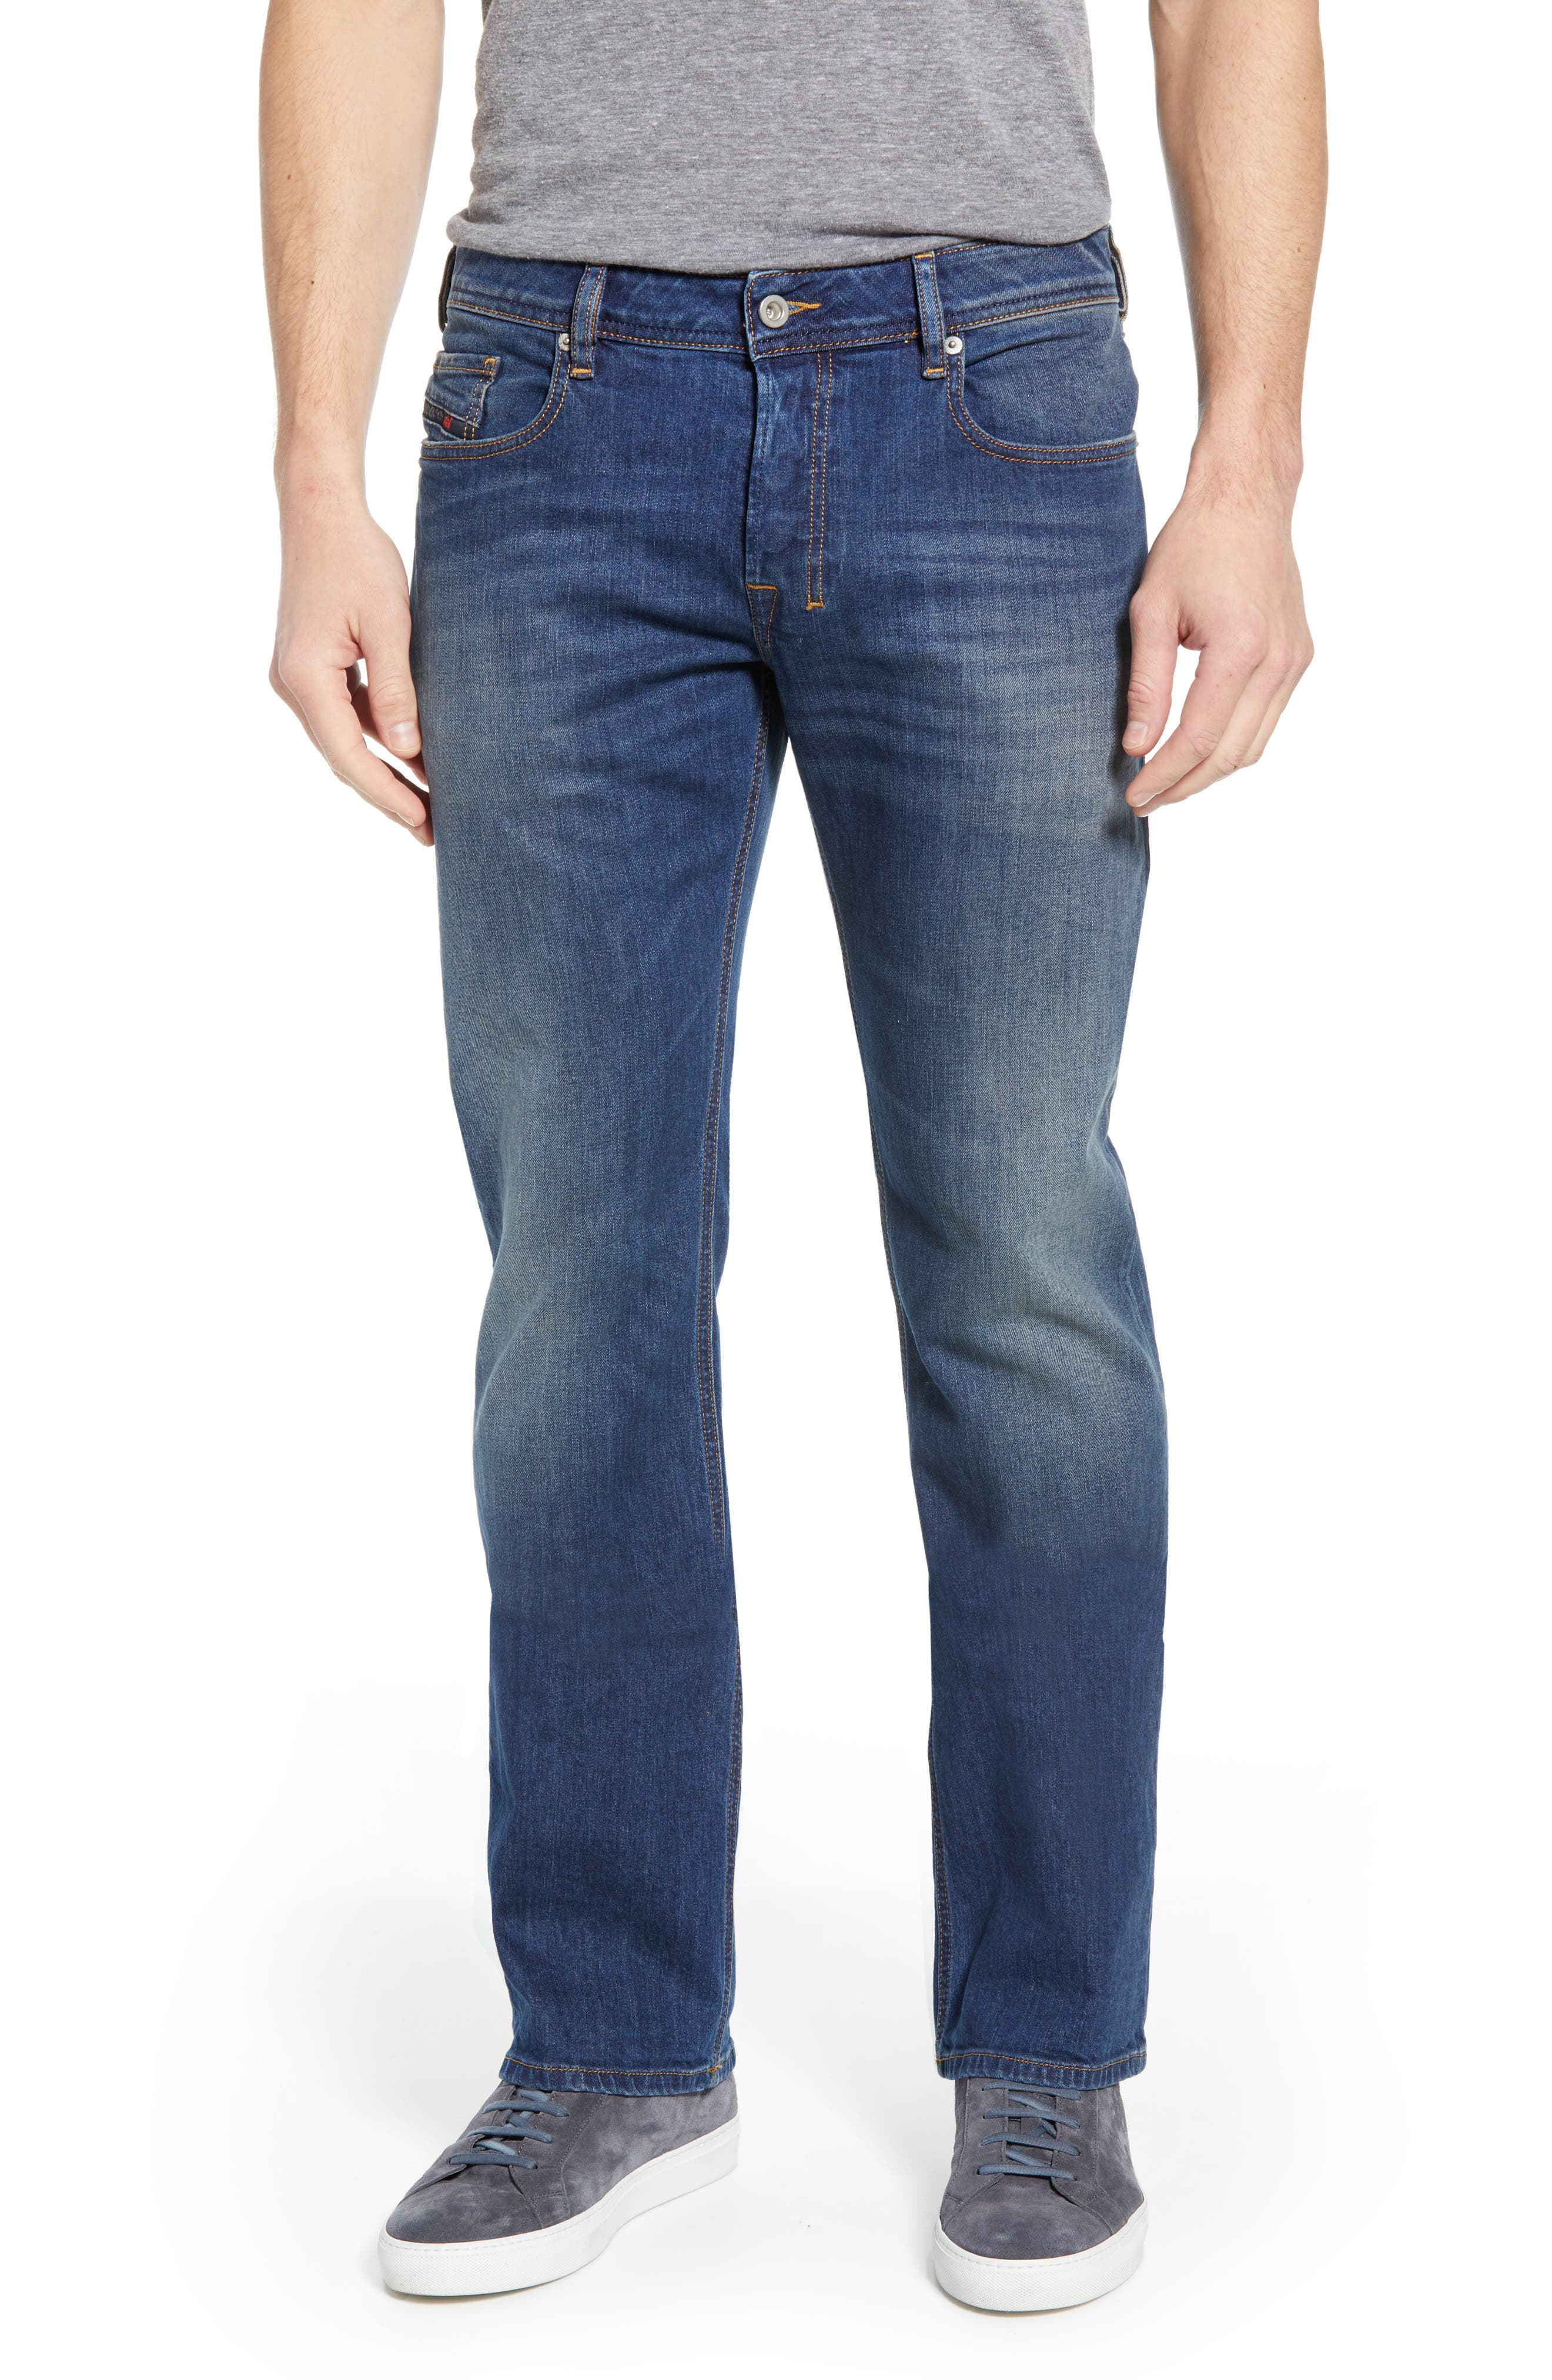 DIESEL<SUP>®</SUP> Zatiny Bootcut Jeans, Main, color, DENIM